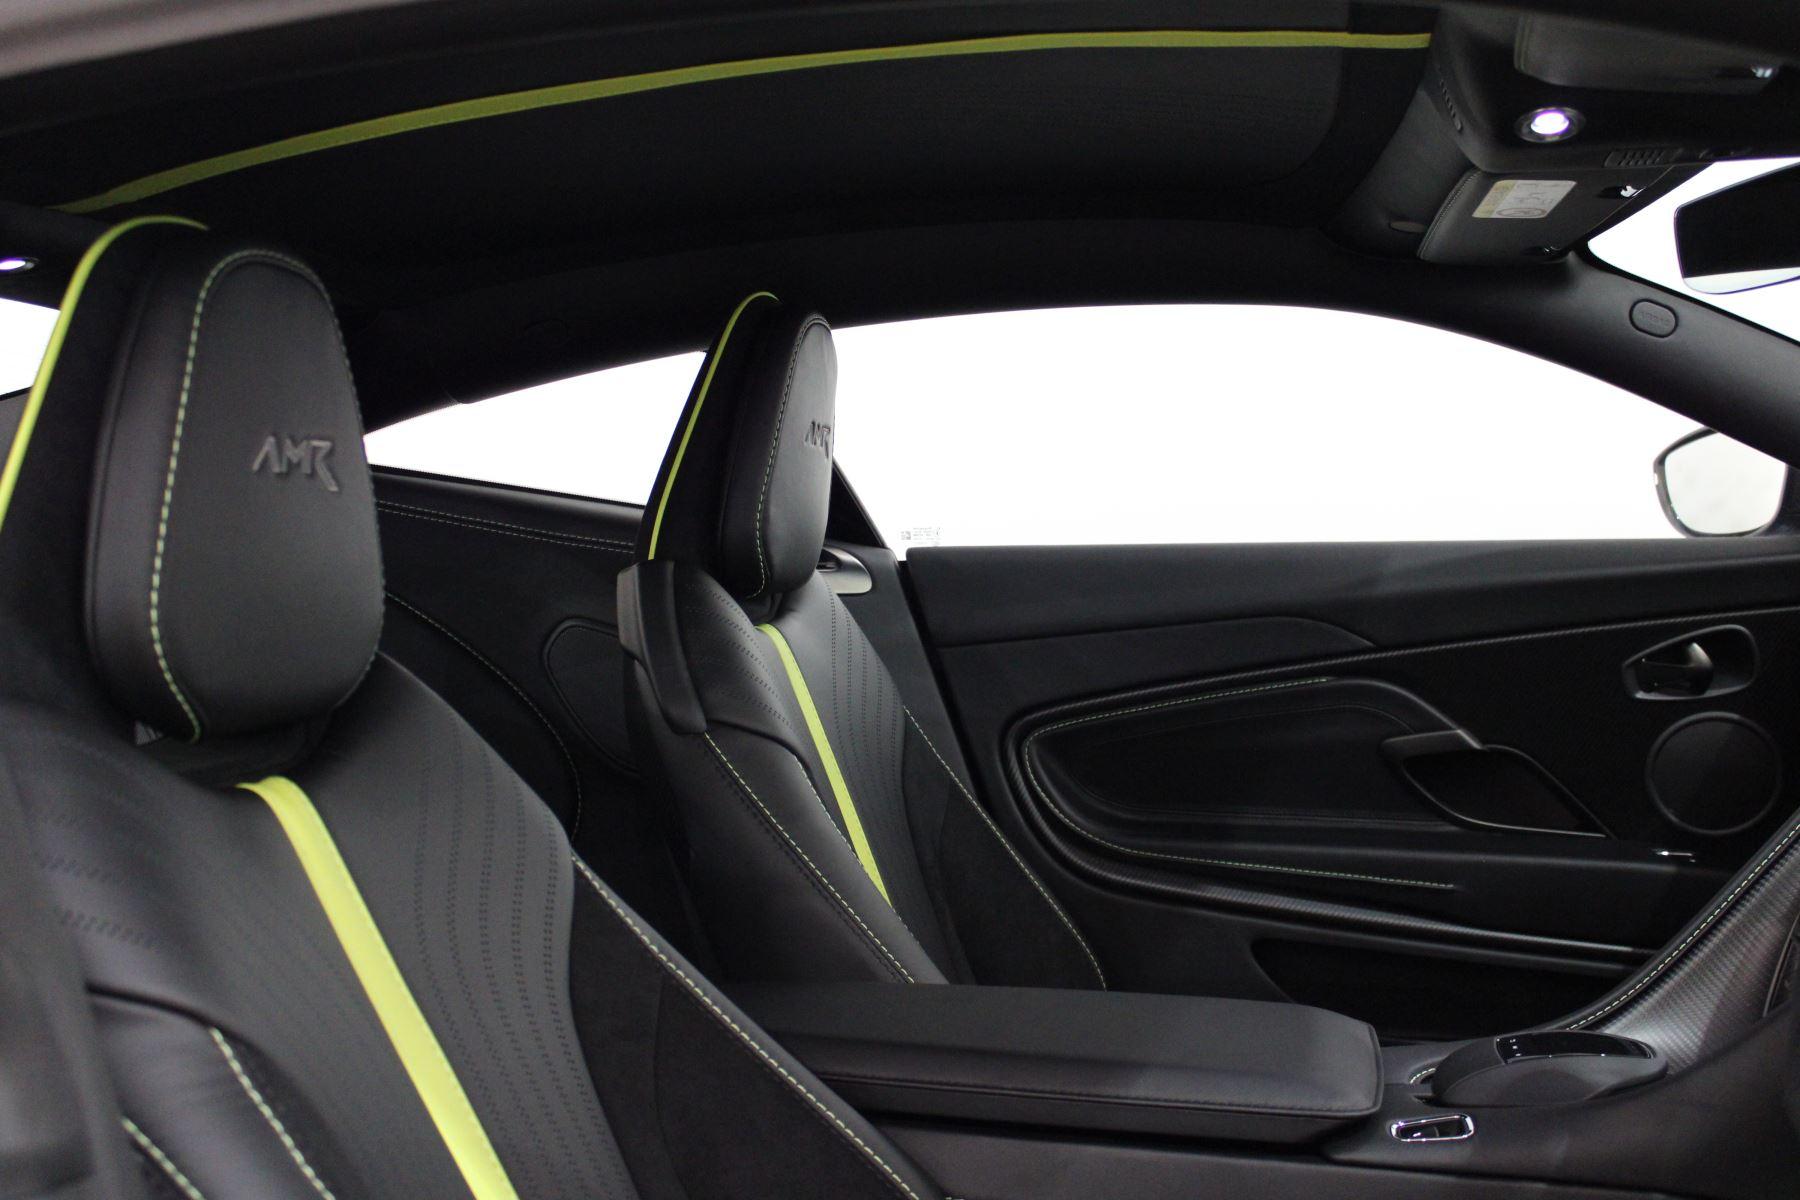 Aston Martin DB11 V12 AMR Touchtronic image 26